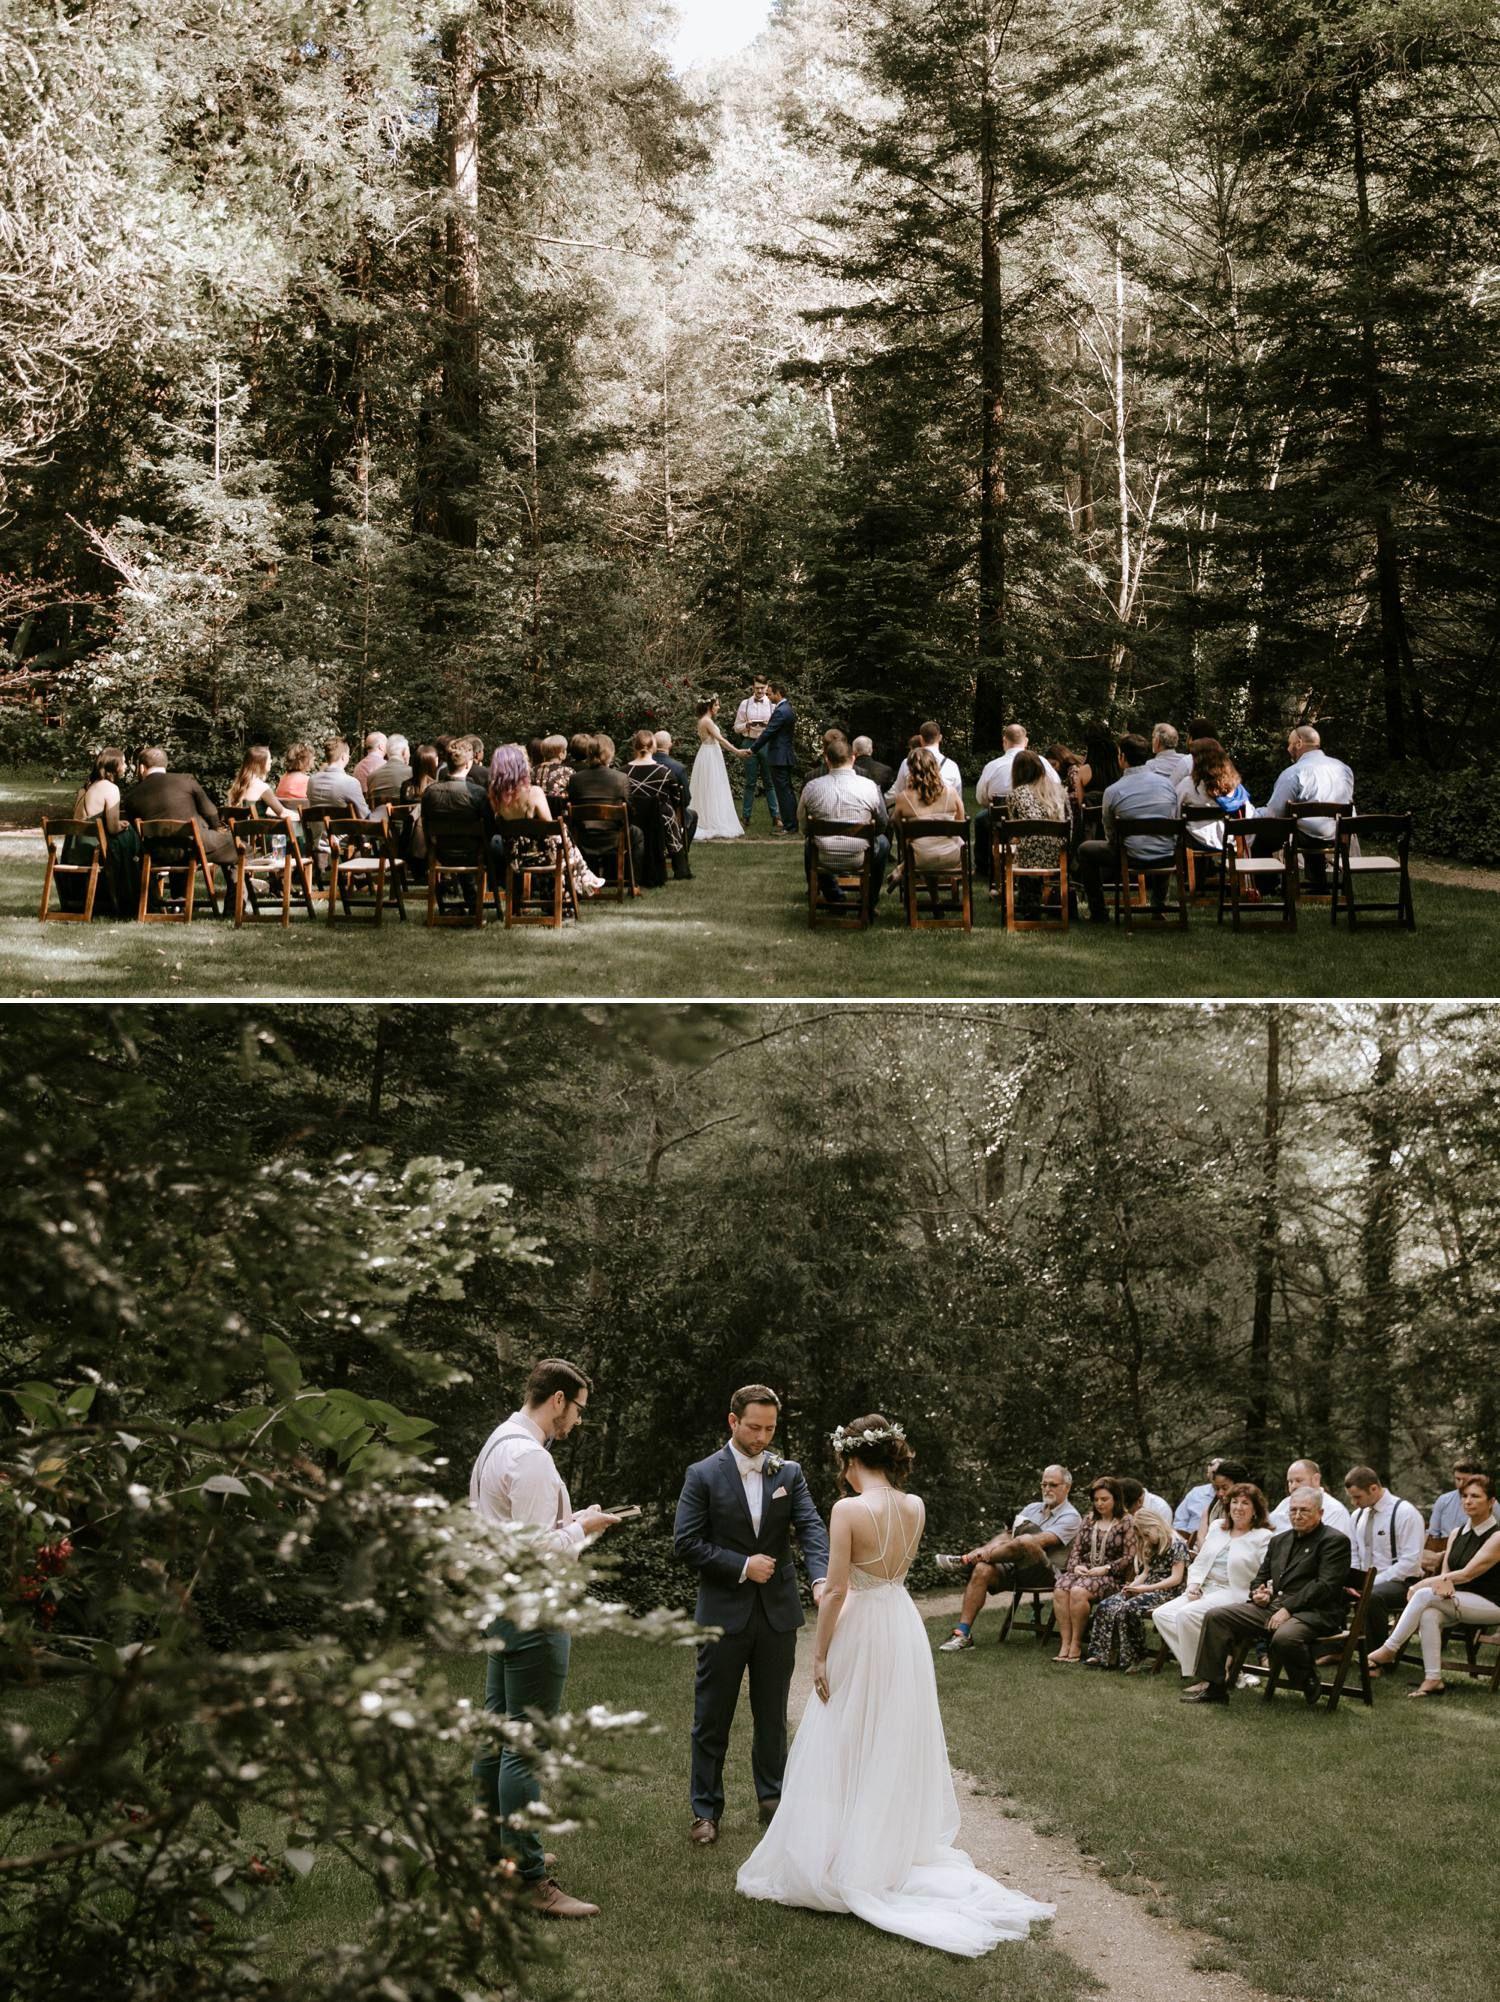 Big Sur Bakery And Glen Oaks Wedding Paige Nelson Photography Big Sur Wedding Small Weddings Ceremony Wedding Inspiration Summer